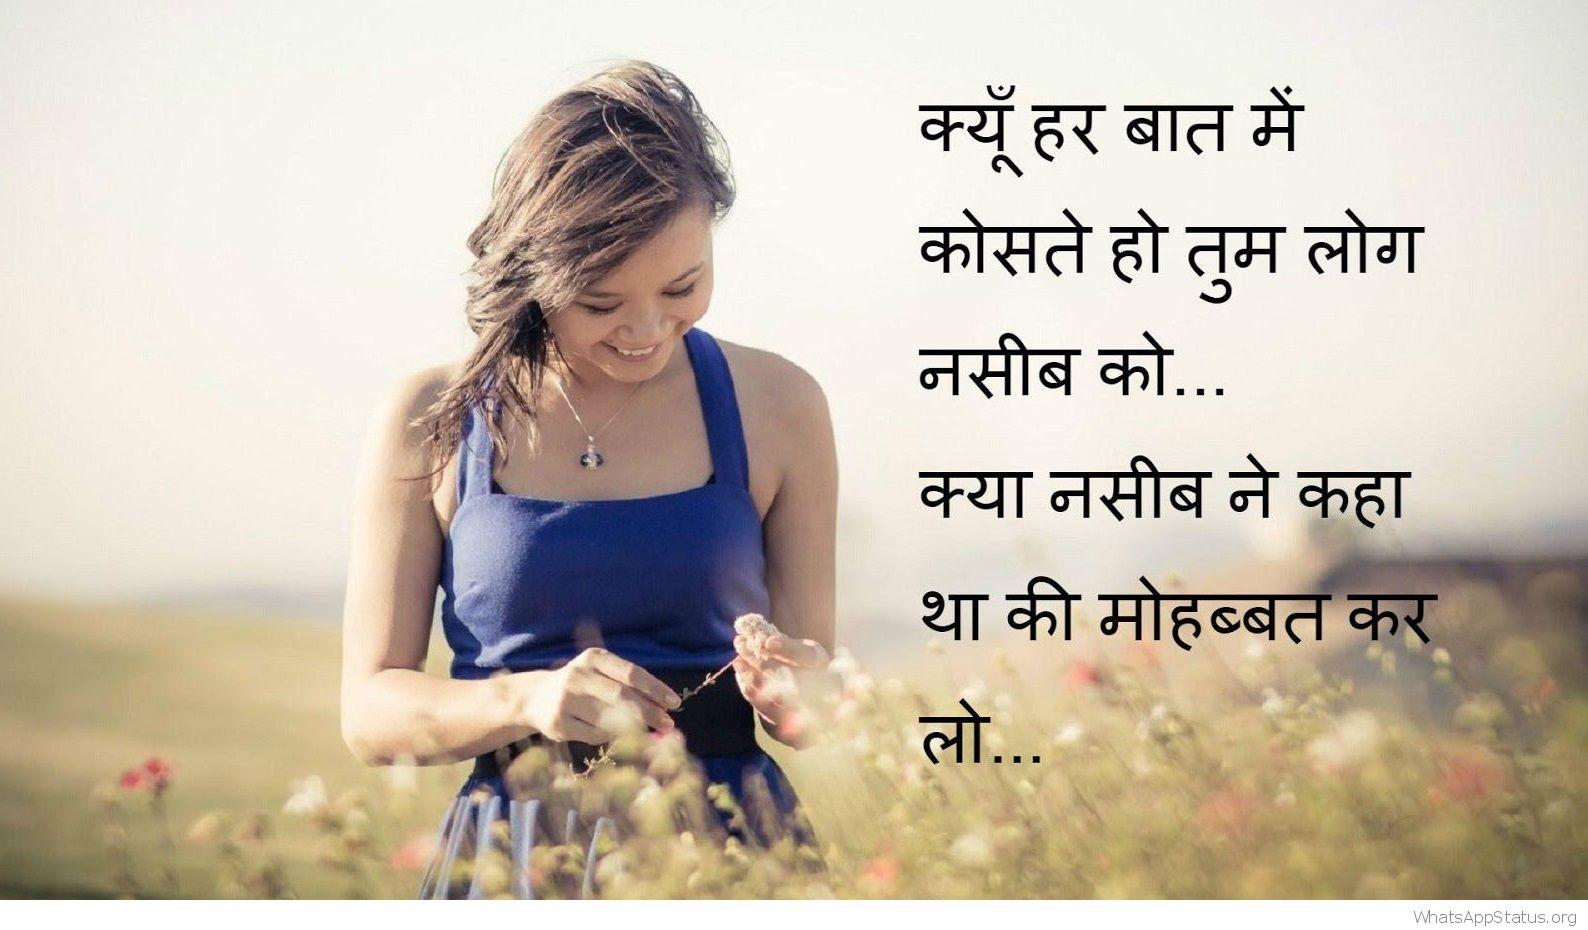 Hindi Love Clipart - Sad Love Hindi Shayari For Girlfriend - HD Wallpaper